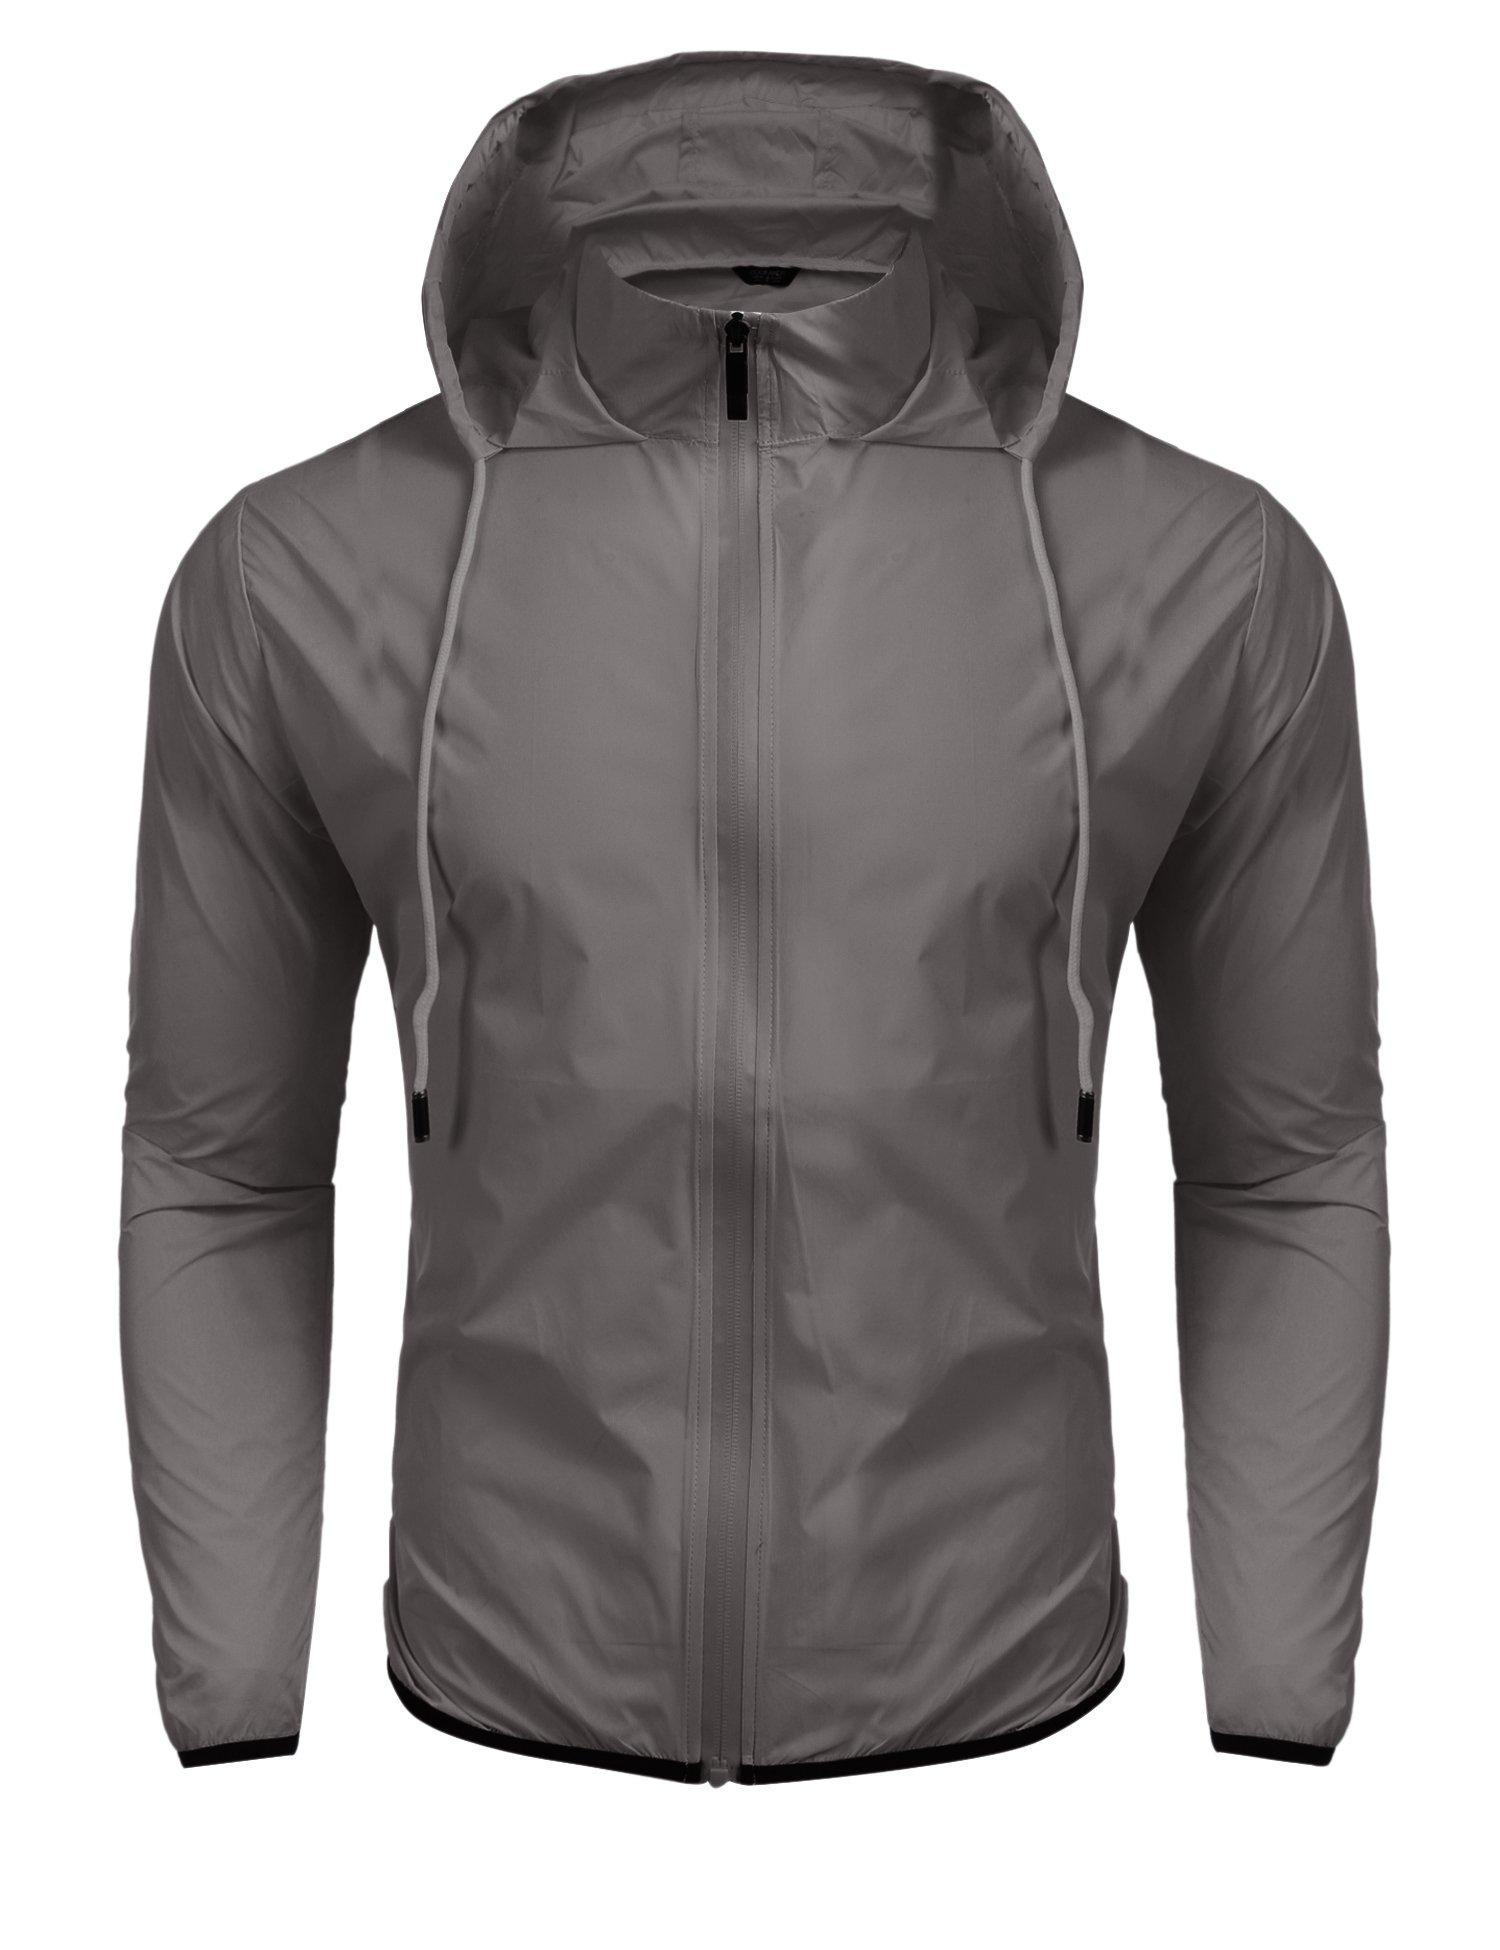 Jinidu Men's Cycling Skin Coat Jersey Bicycle Windproof Jacket Rain Coat (Medium, Light Khaki) by Jinidu (Image #2)